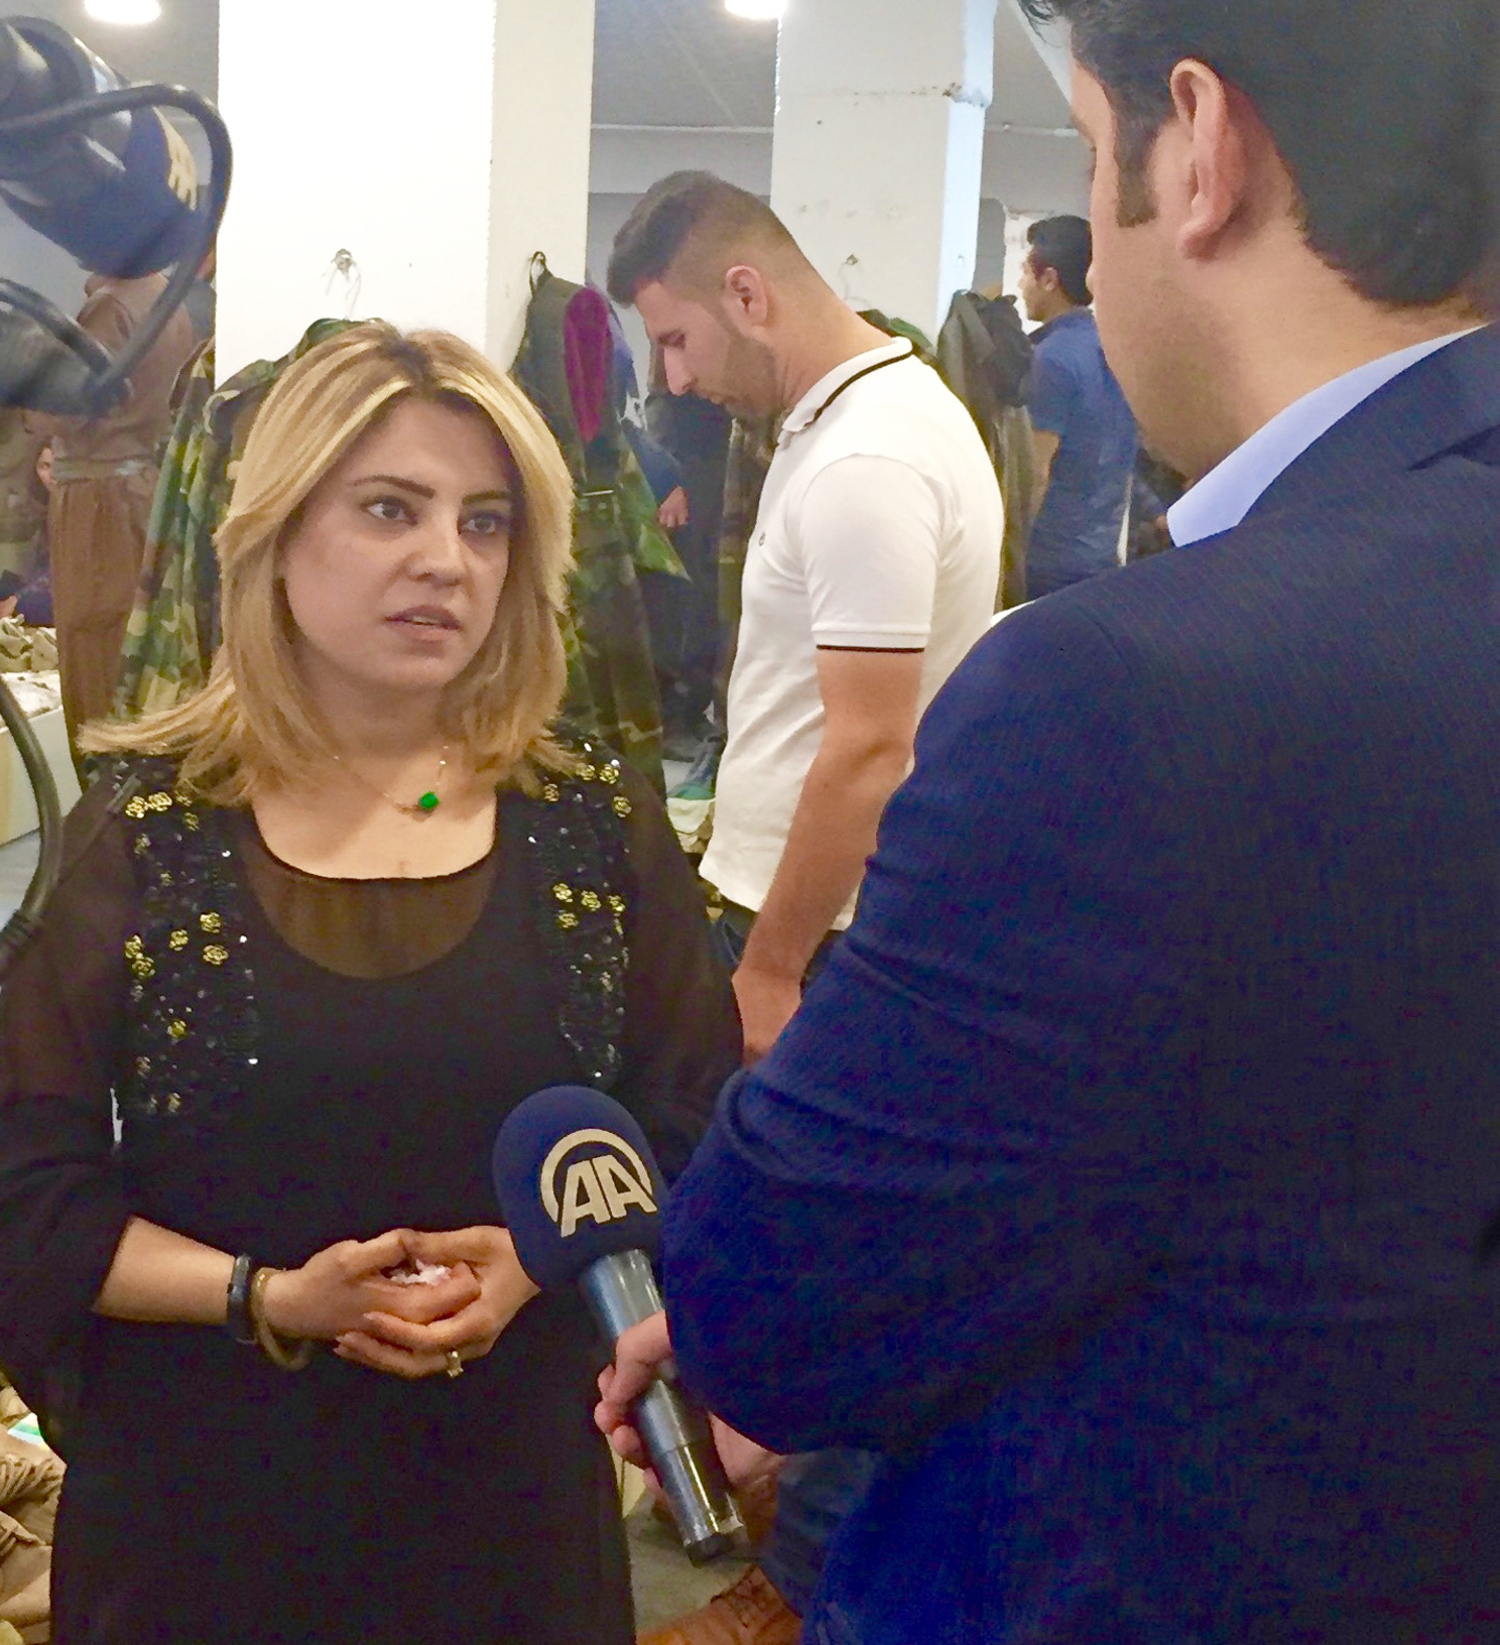 Kurdish journalist Friyal Faisal being interviewed by a local news network May 2, 2016